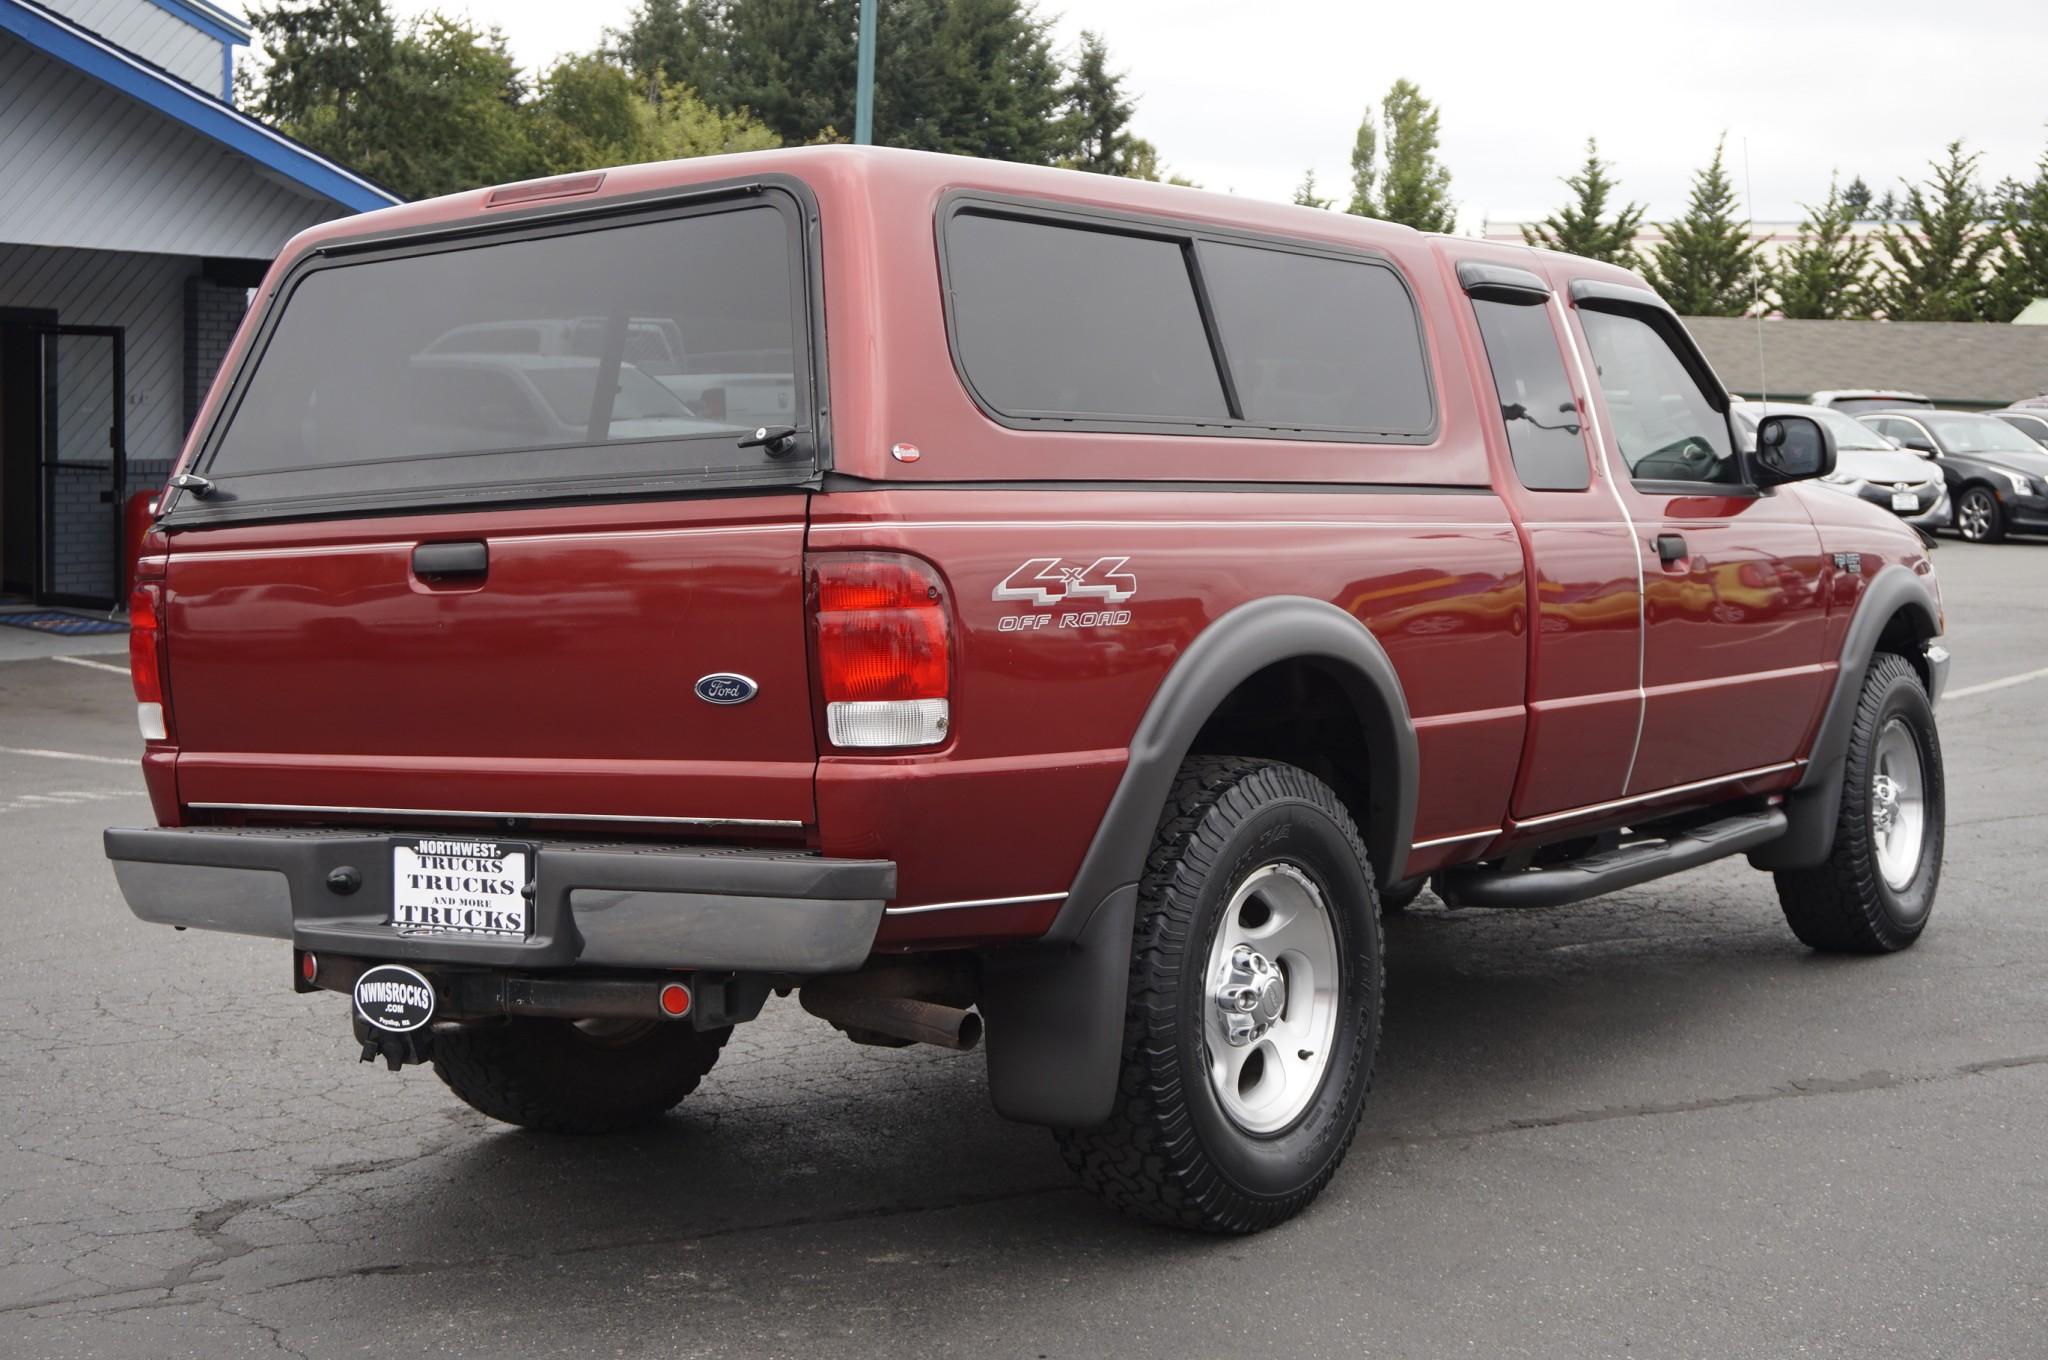 used 2000 ford ranger xlt 4x4 truck for sale 33709a. Black Bedroom Furniture Sets. Home Design Ideas